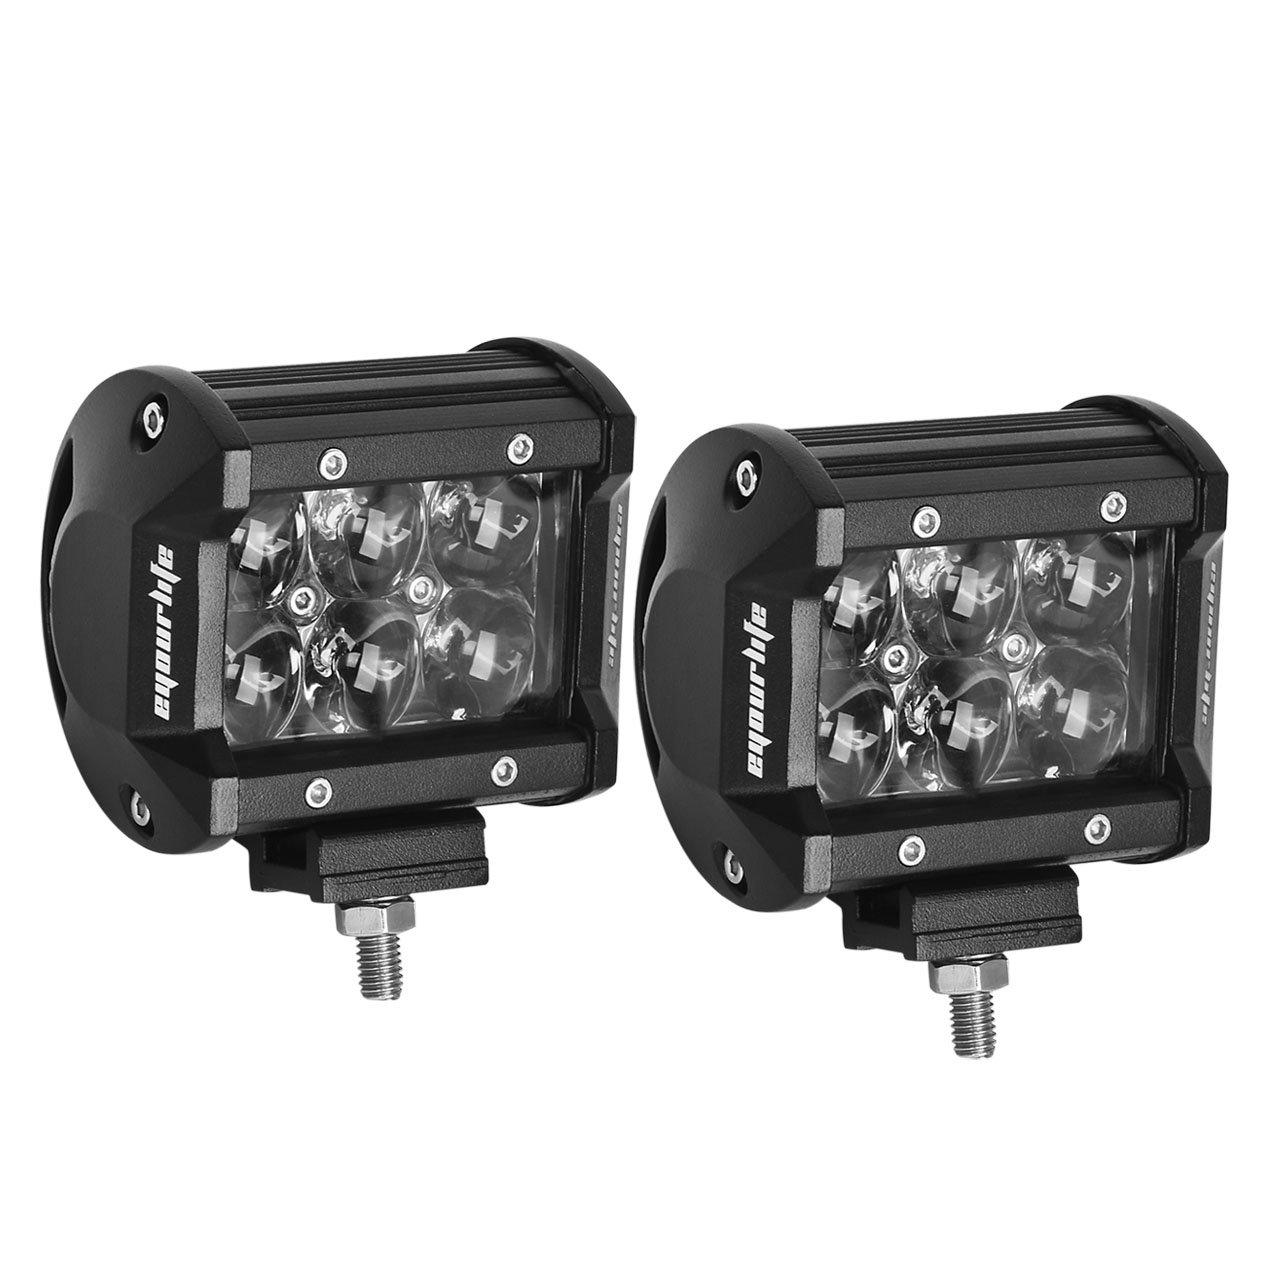 Amazon.com: Led Light Pods, Eyourlife 18W Fish Eye 4D Lens Flood ...